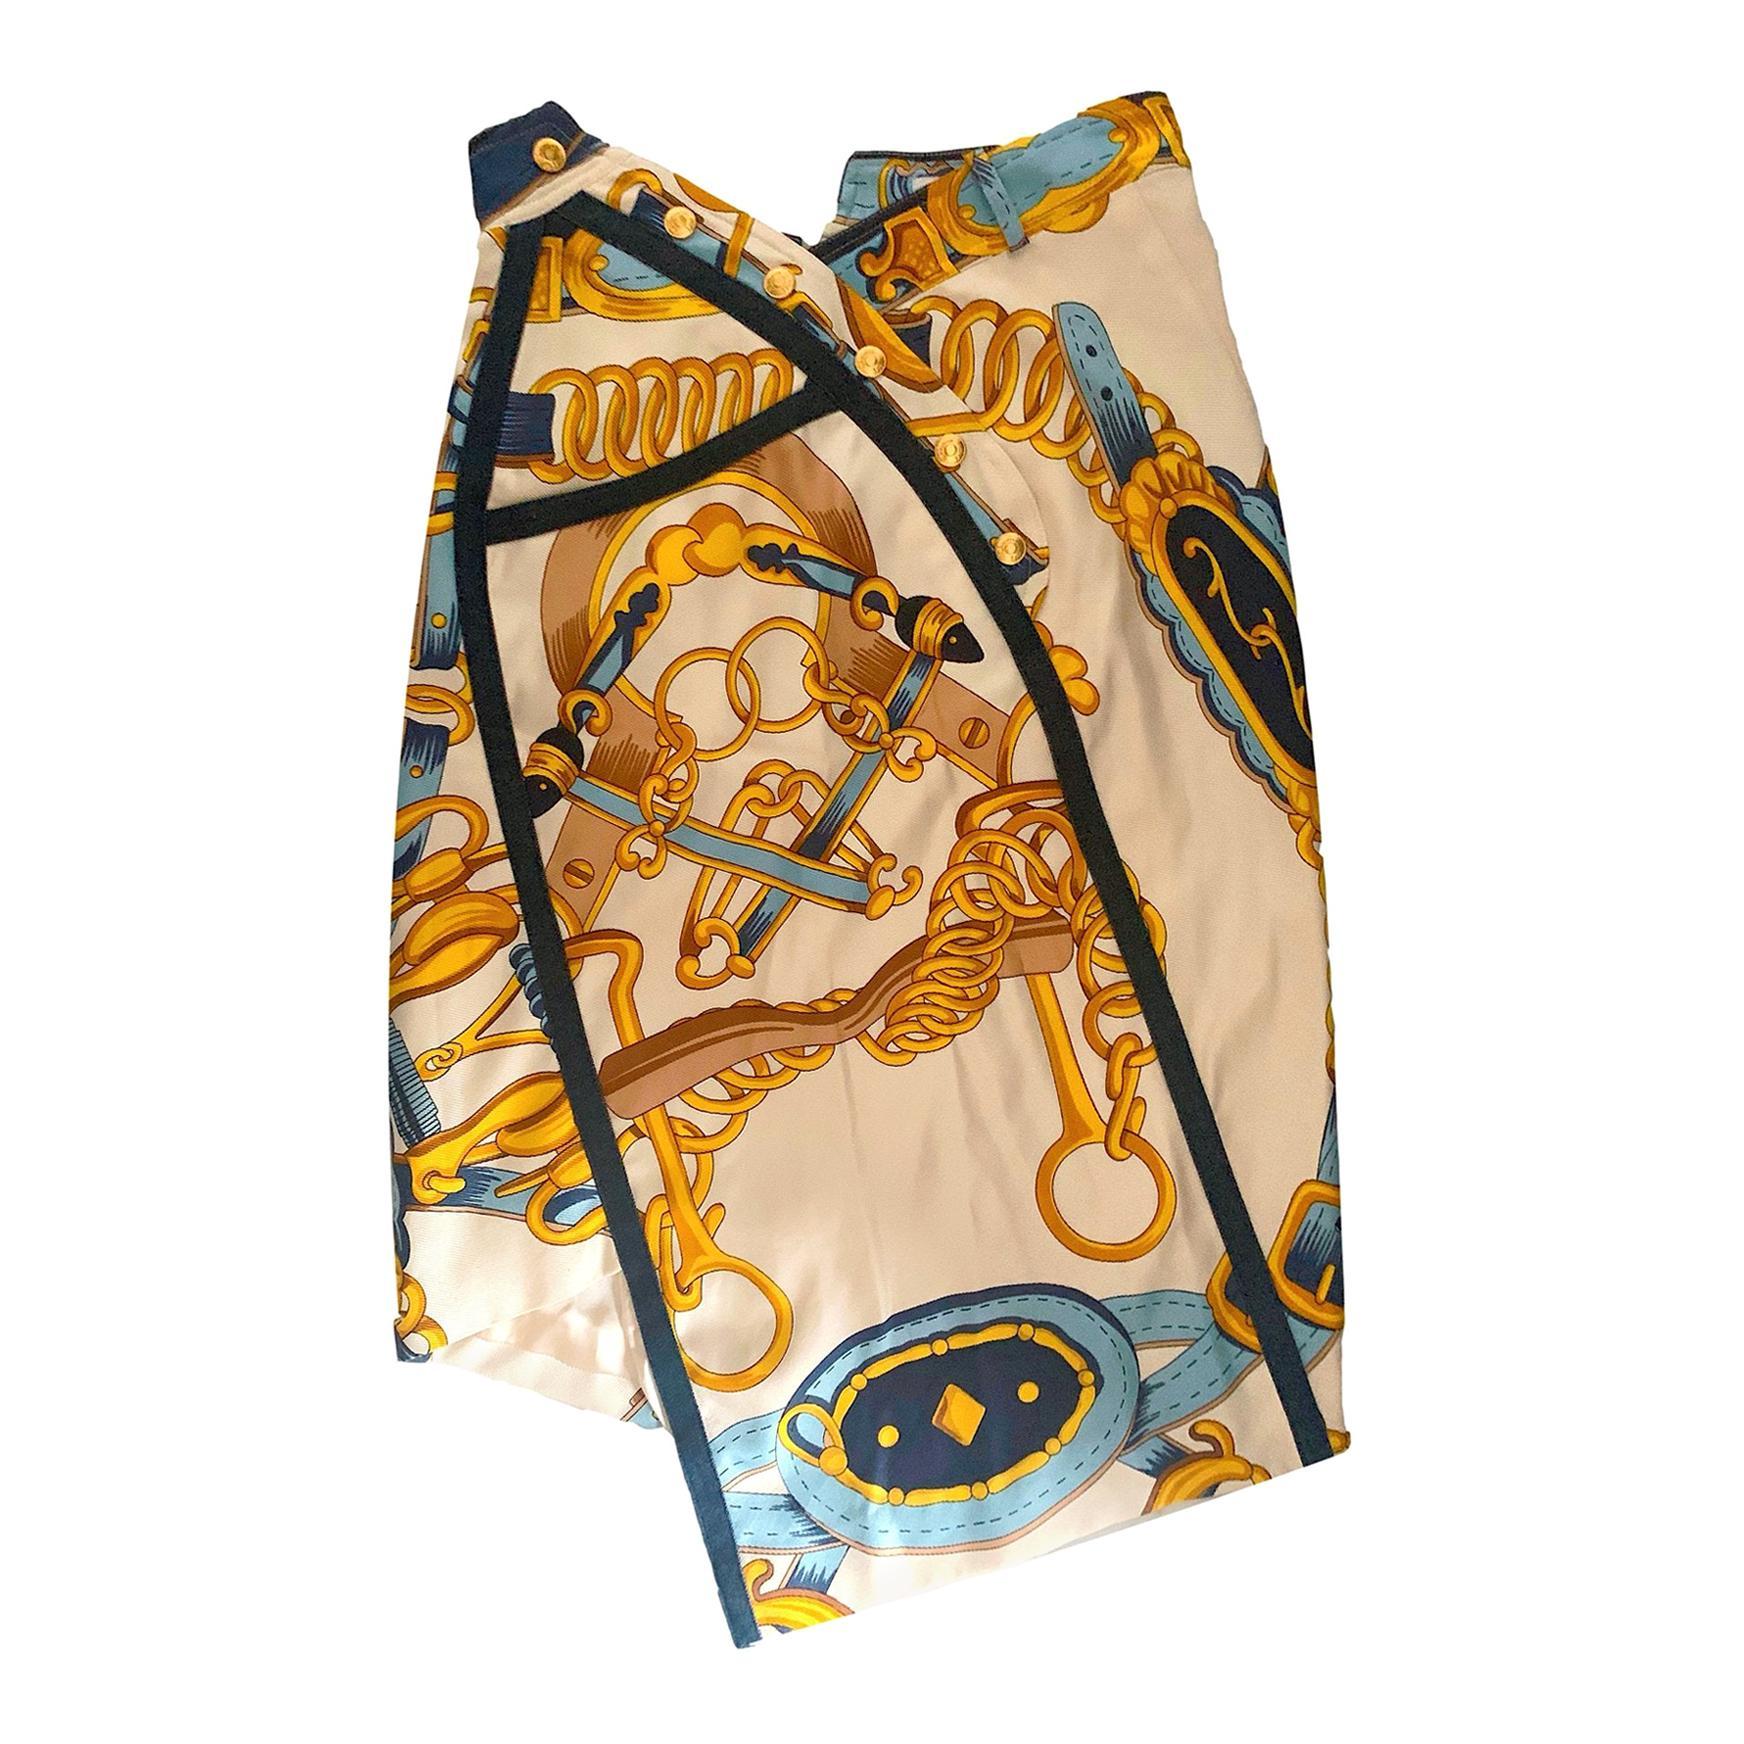 Iconic S/S 2000 John Galliano for Christian Dior Saddle Print Skirt